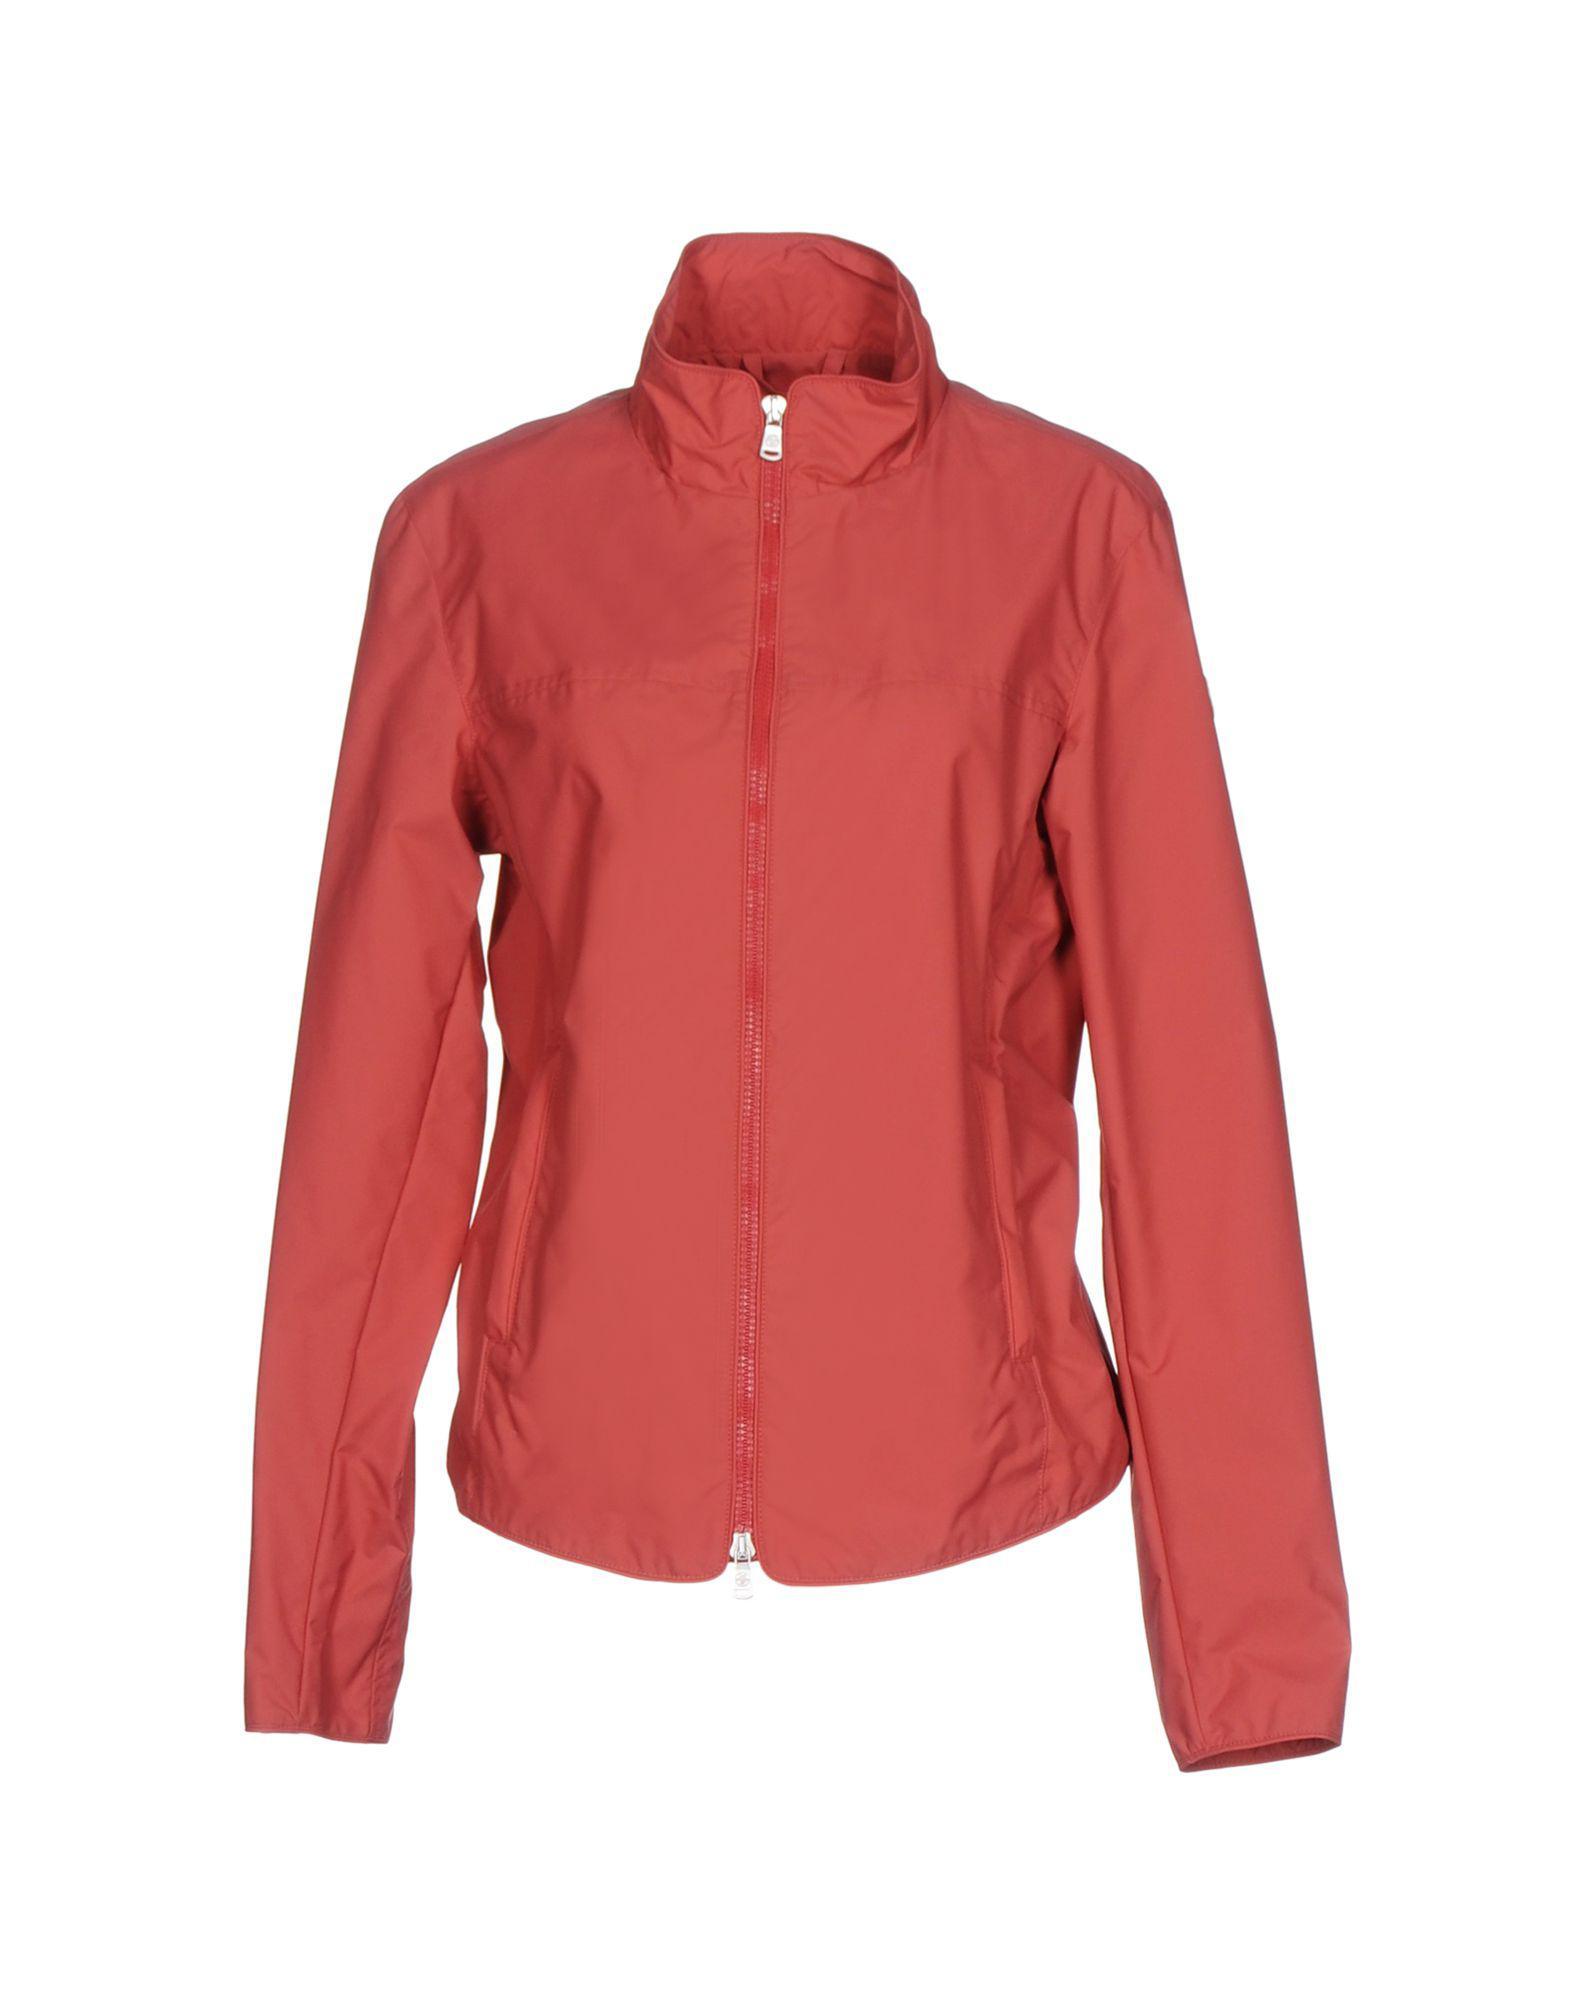 lyst north sails jacket in red. Black Bedroom Furniture Sets. Home Design Ideas